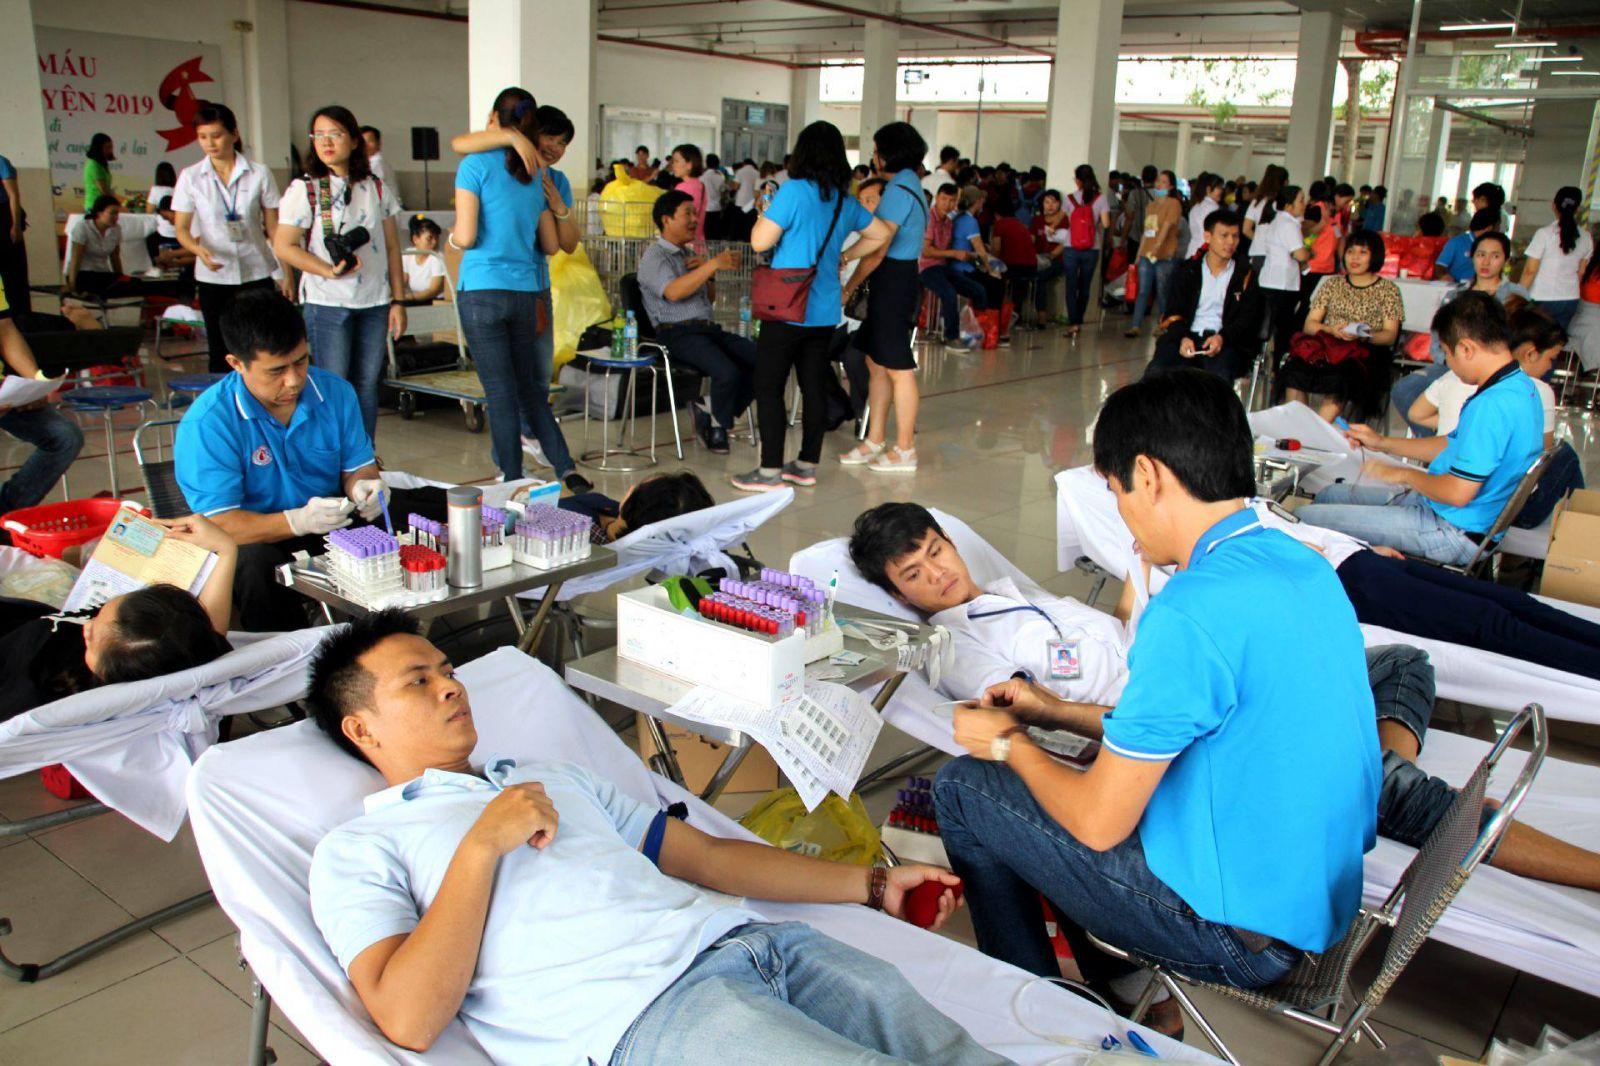 day thun kep _01082019_ anh chu thich 5